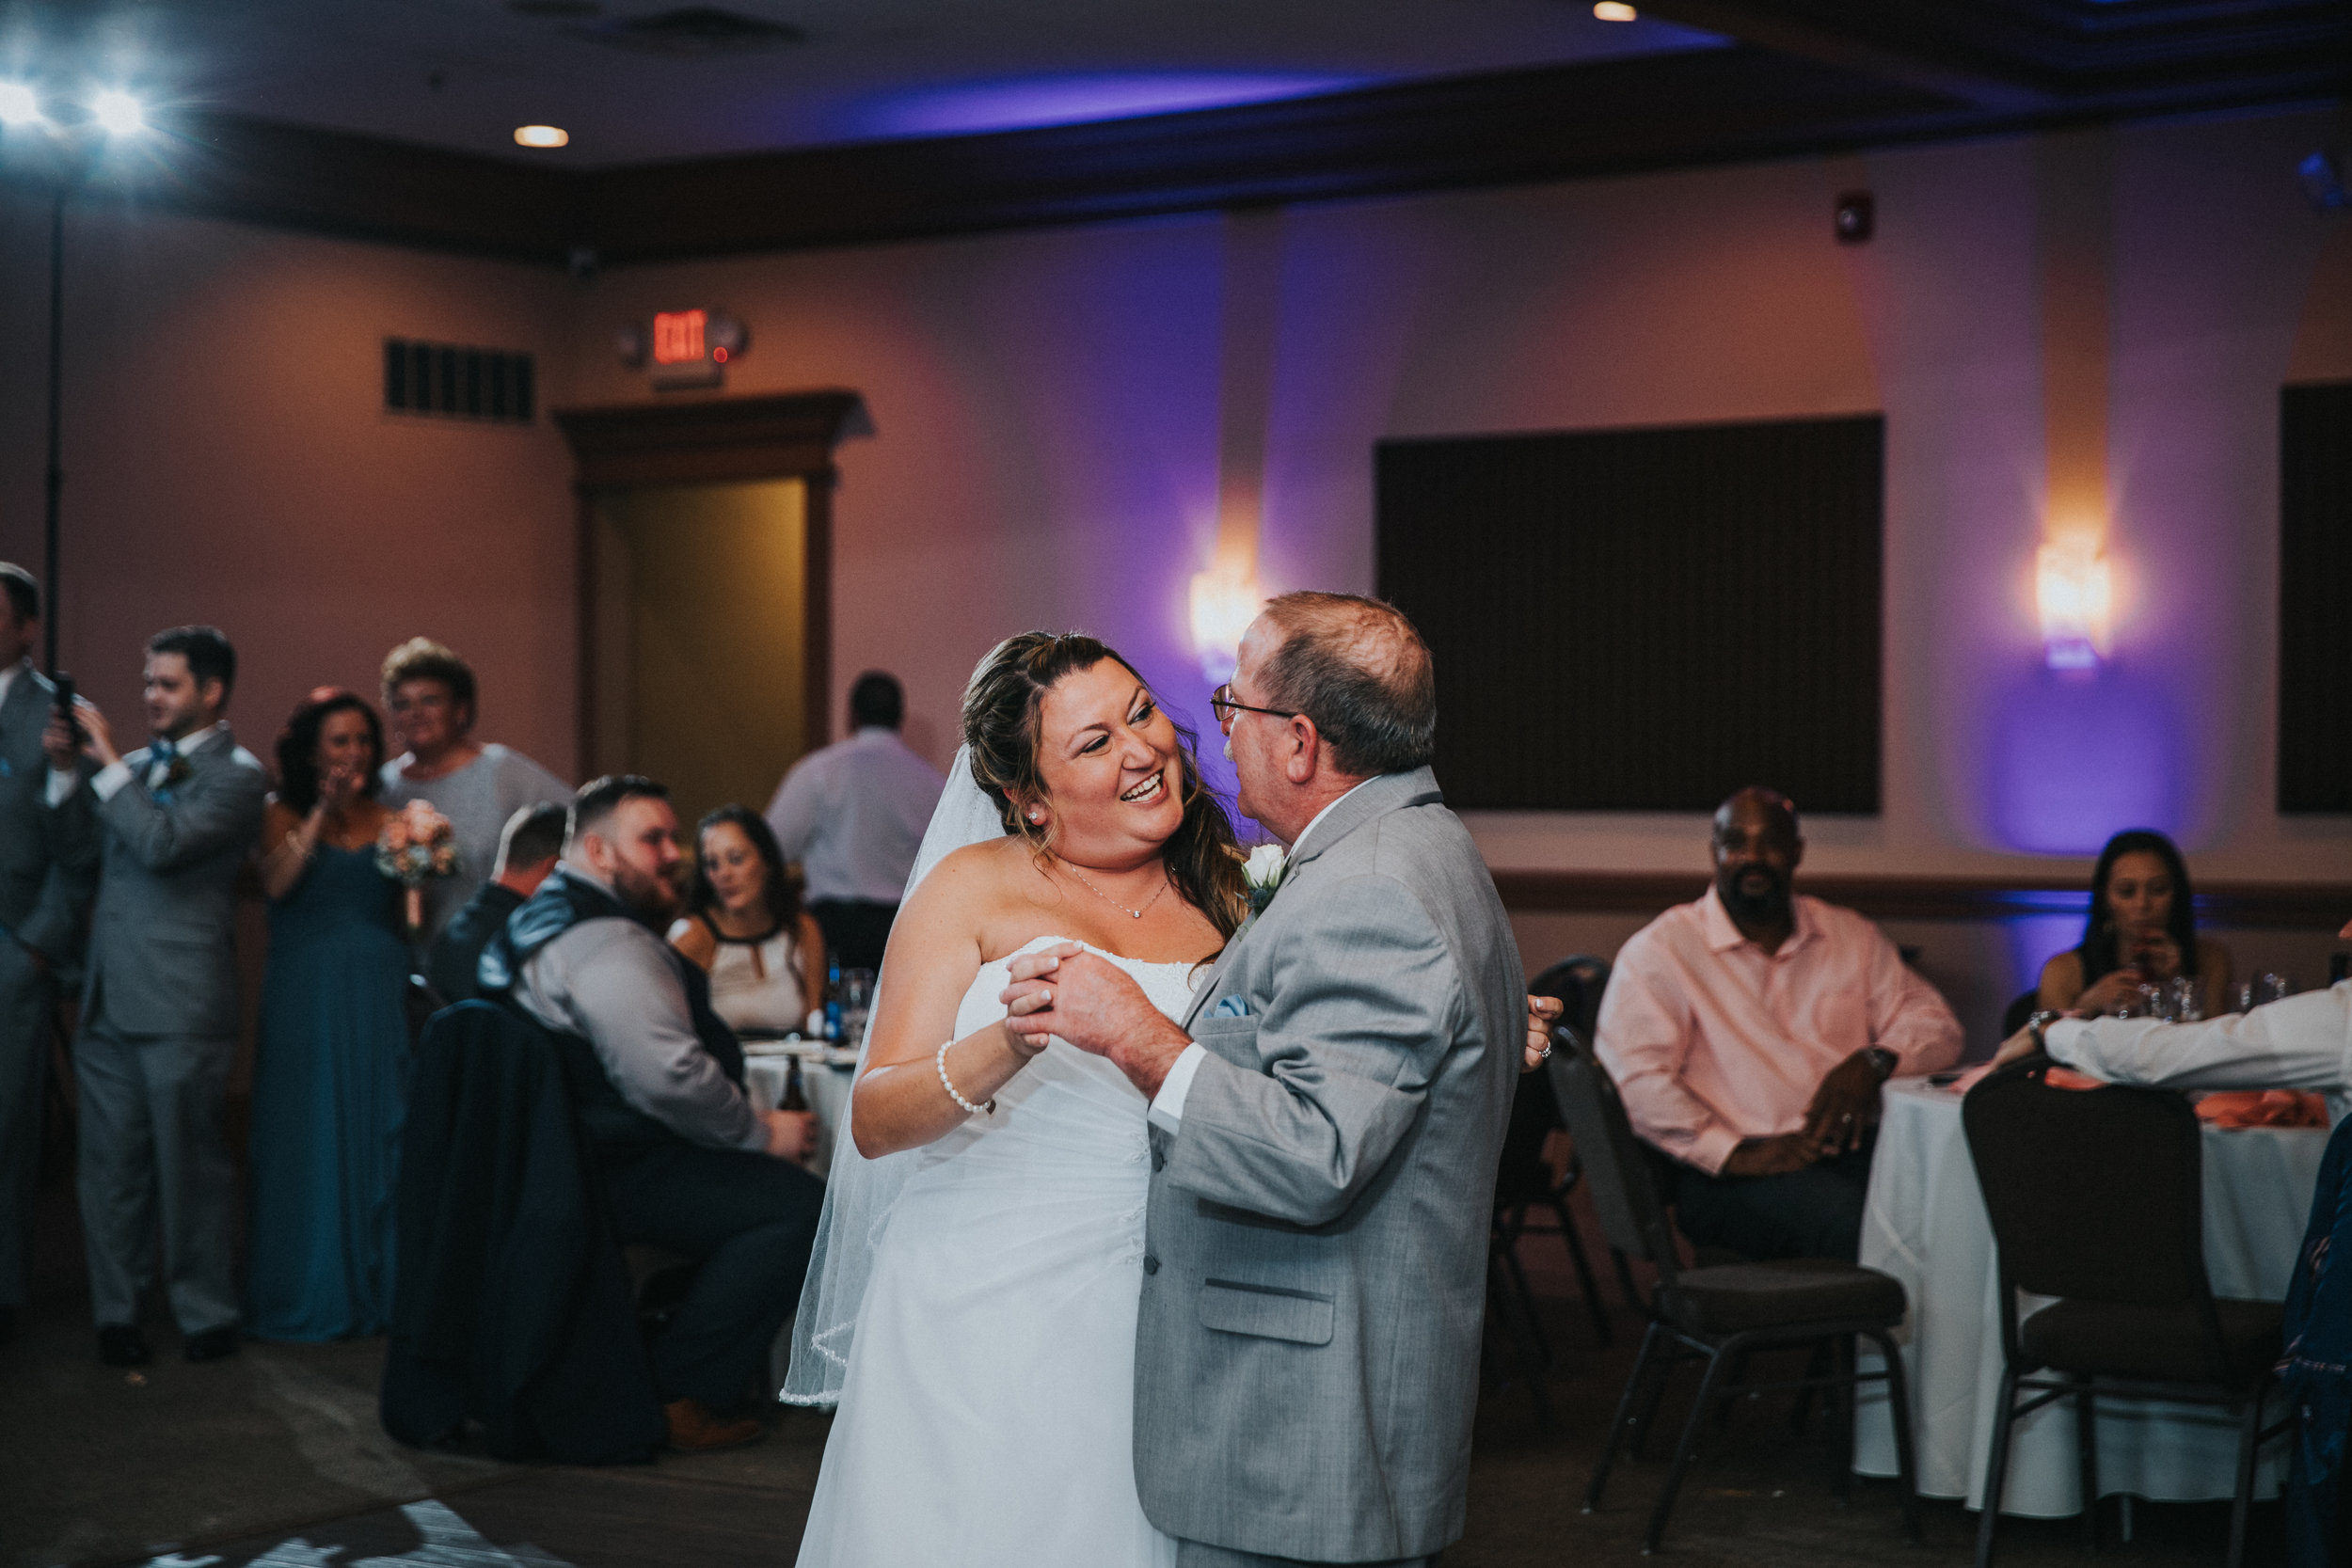 New-Jersey-Wedding-Photographer-JennaLynnPhotography-ValenzanoWinery-Reception-61.jpg